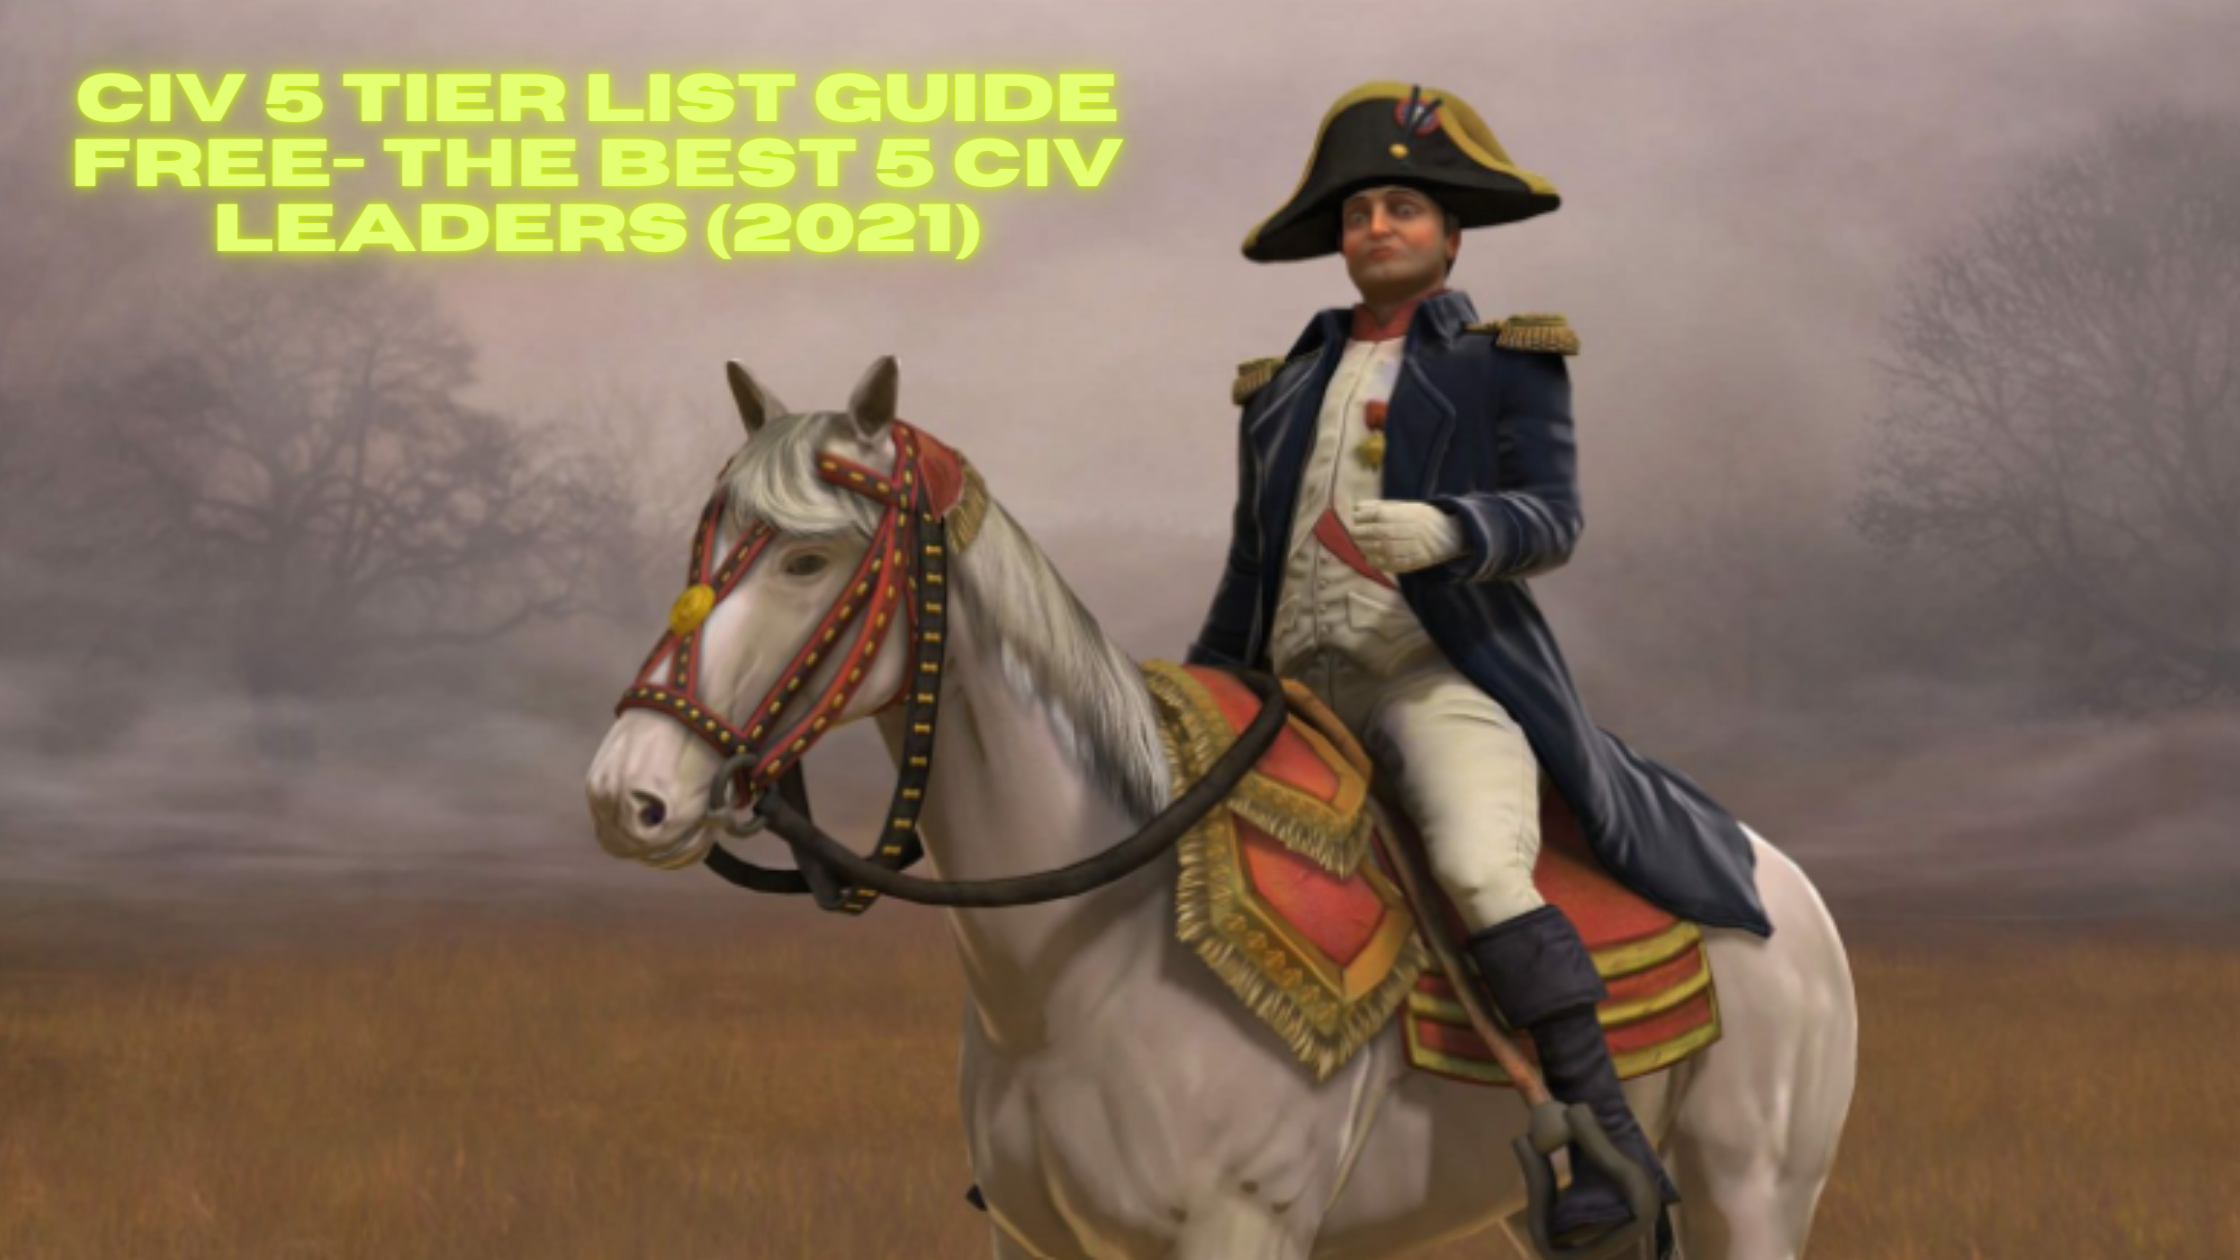 Civ 5 Tier List